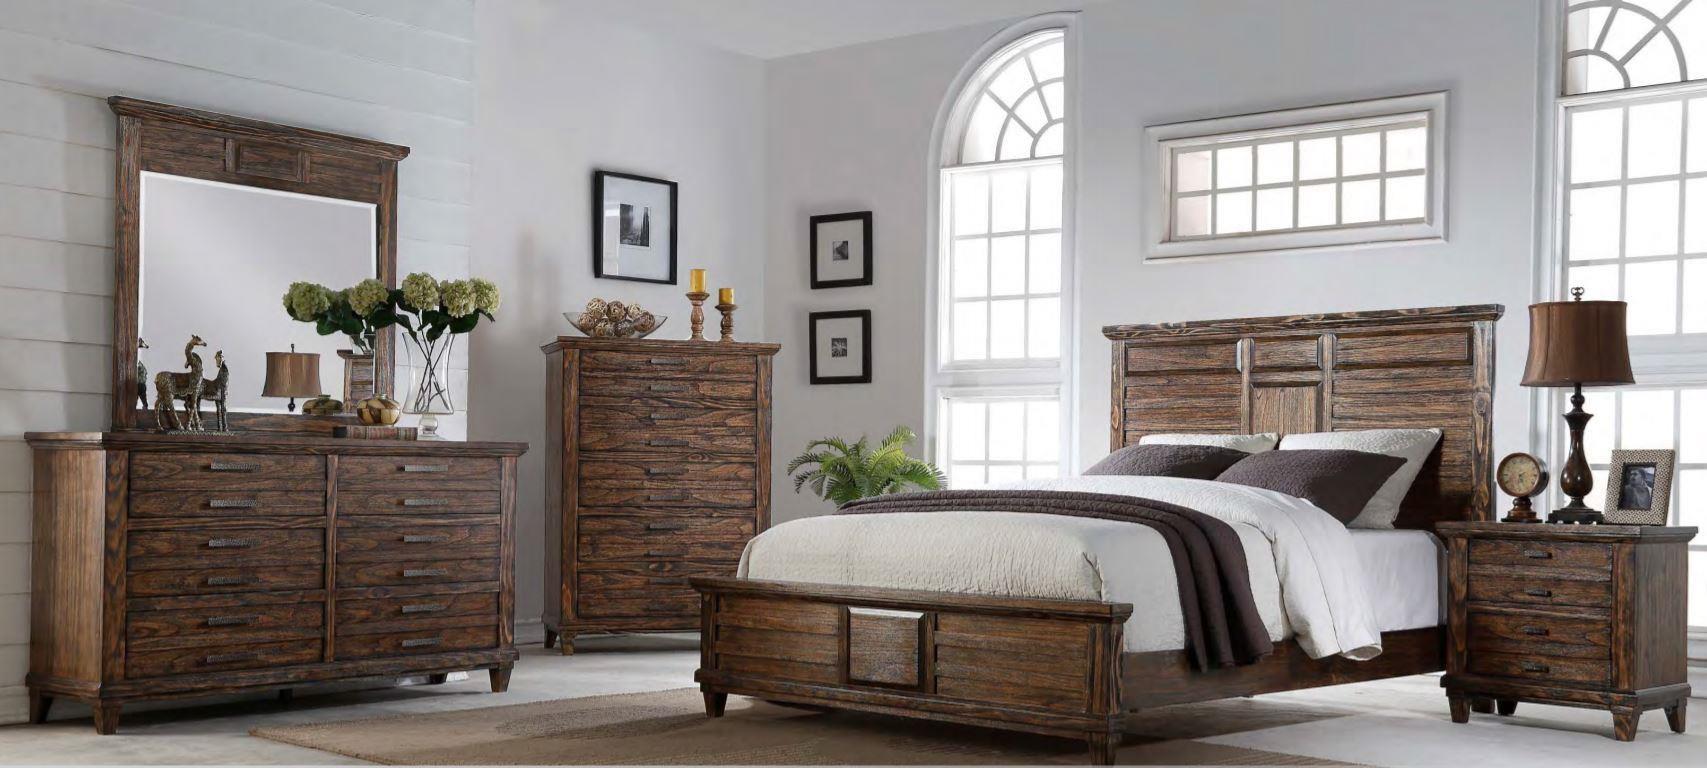 Bernards Cortez King Bed, Dresser, Mirror & Nightstand - Item Number: GRP-1630-KINGSET